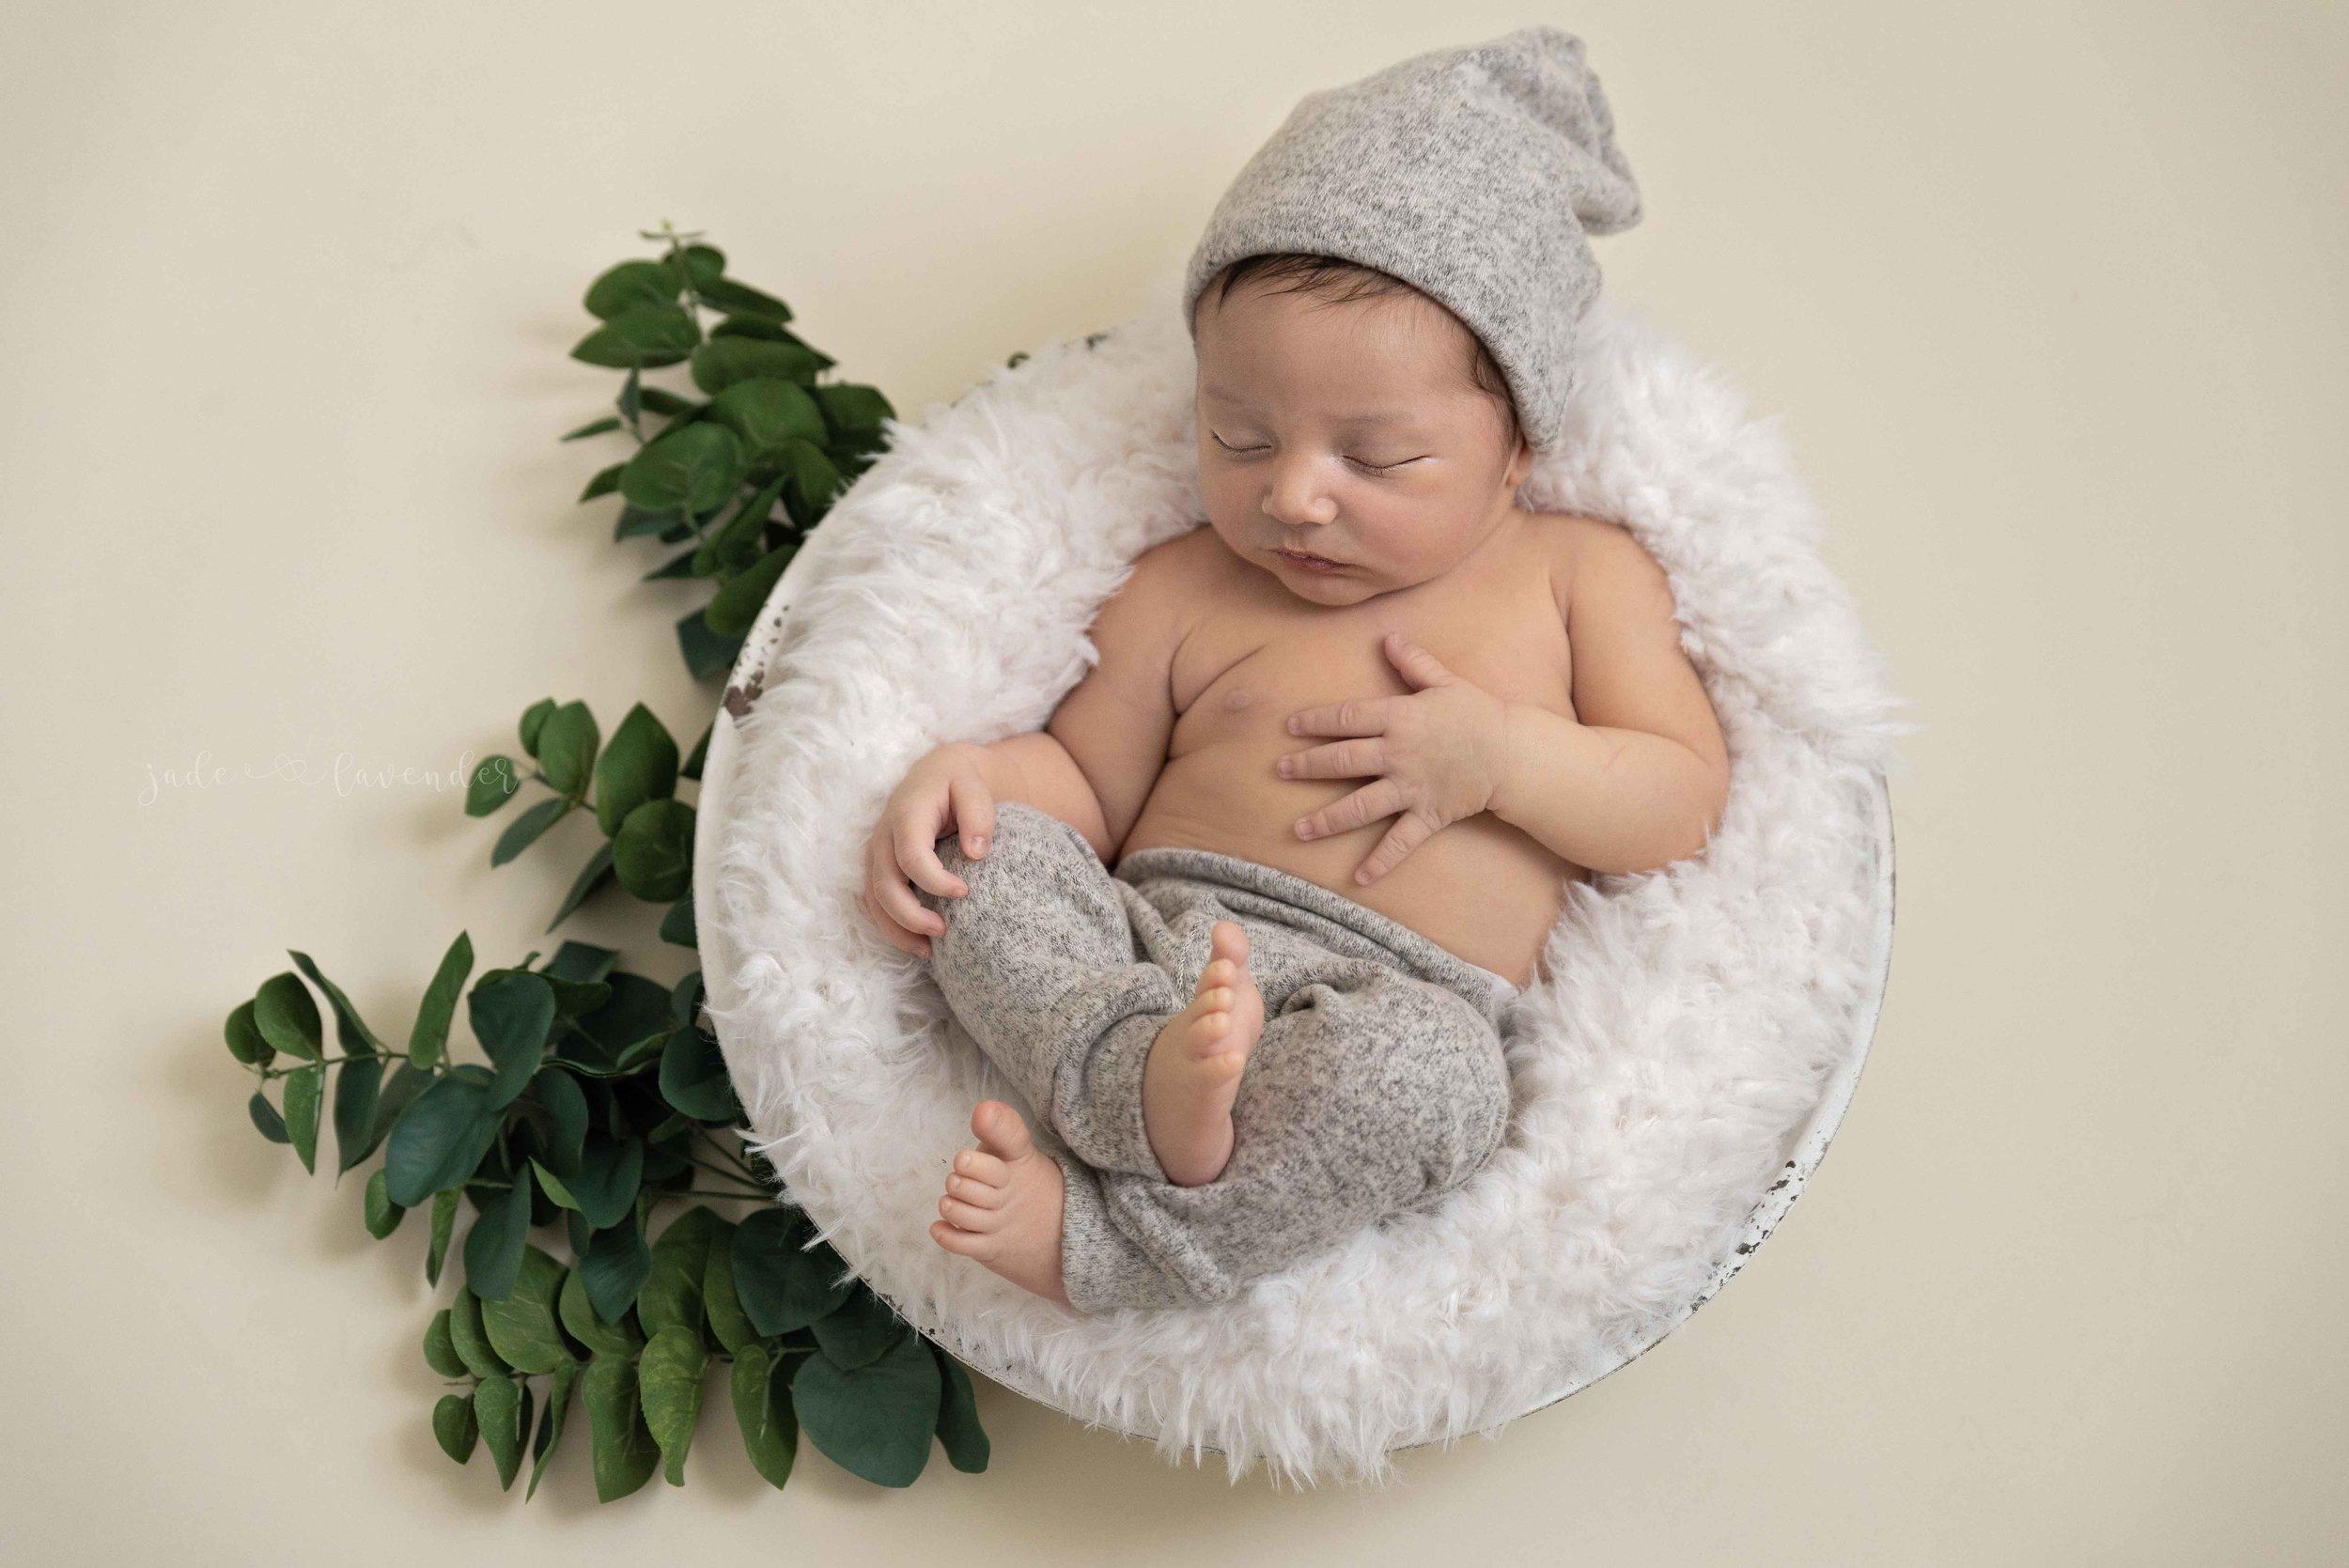 cute-newborn-baby-photos-boy-bowl.jpg